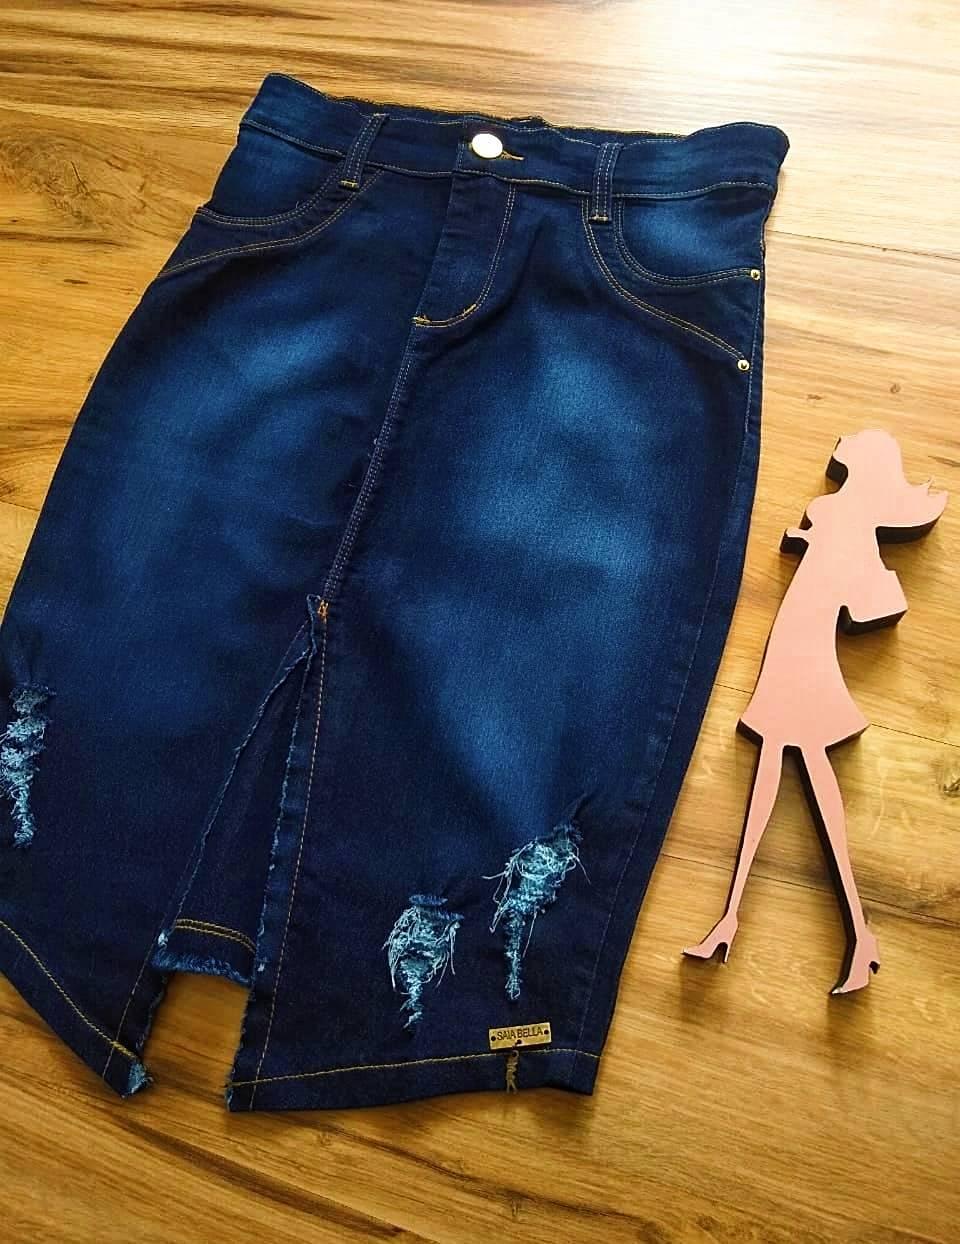 Saia Jeans Barbara SAIA BELLA SB707181 Azul Escuro